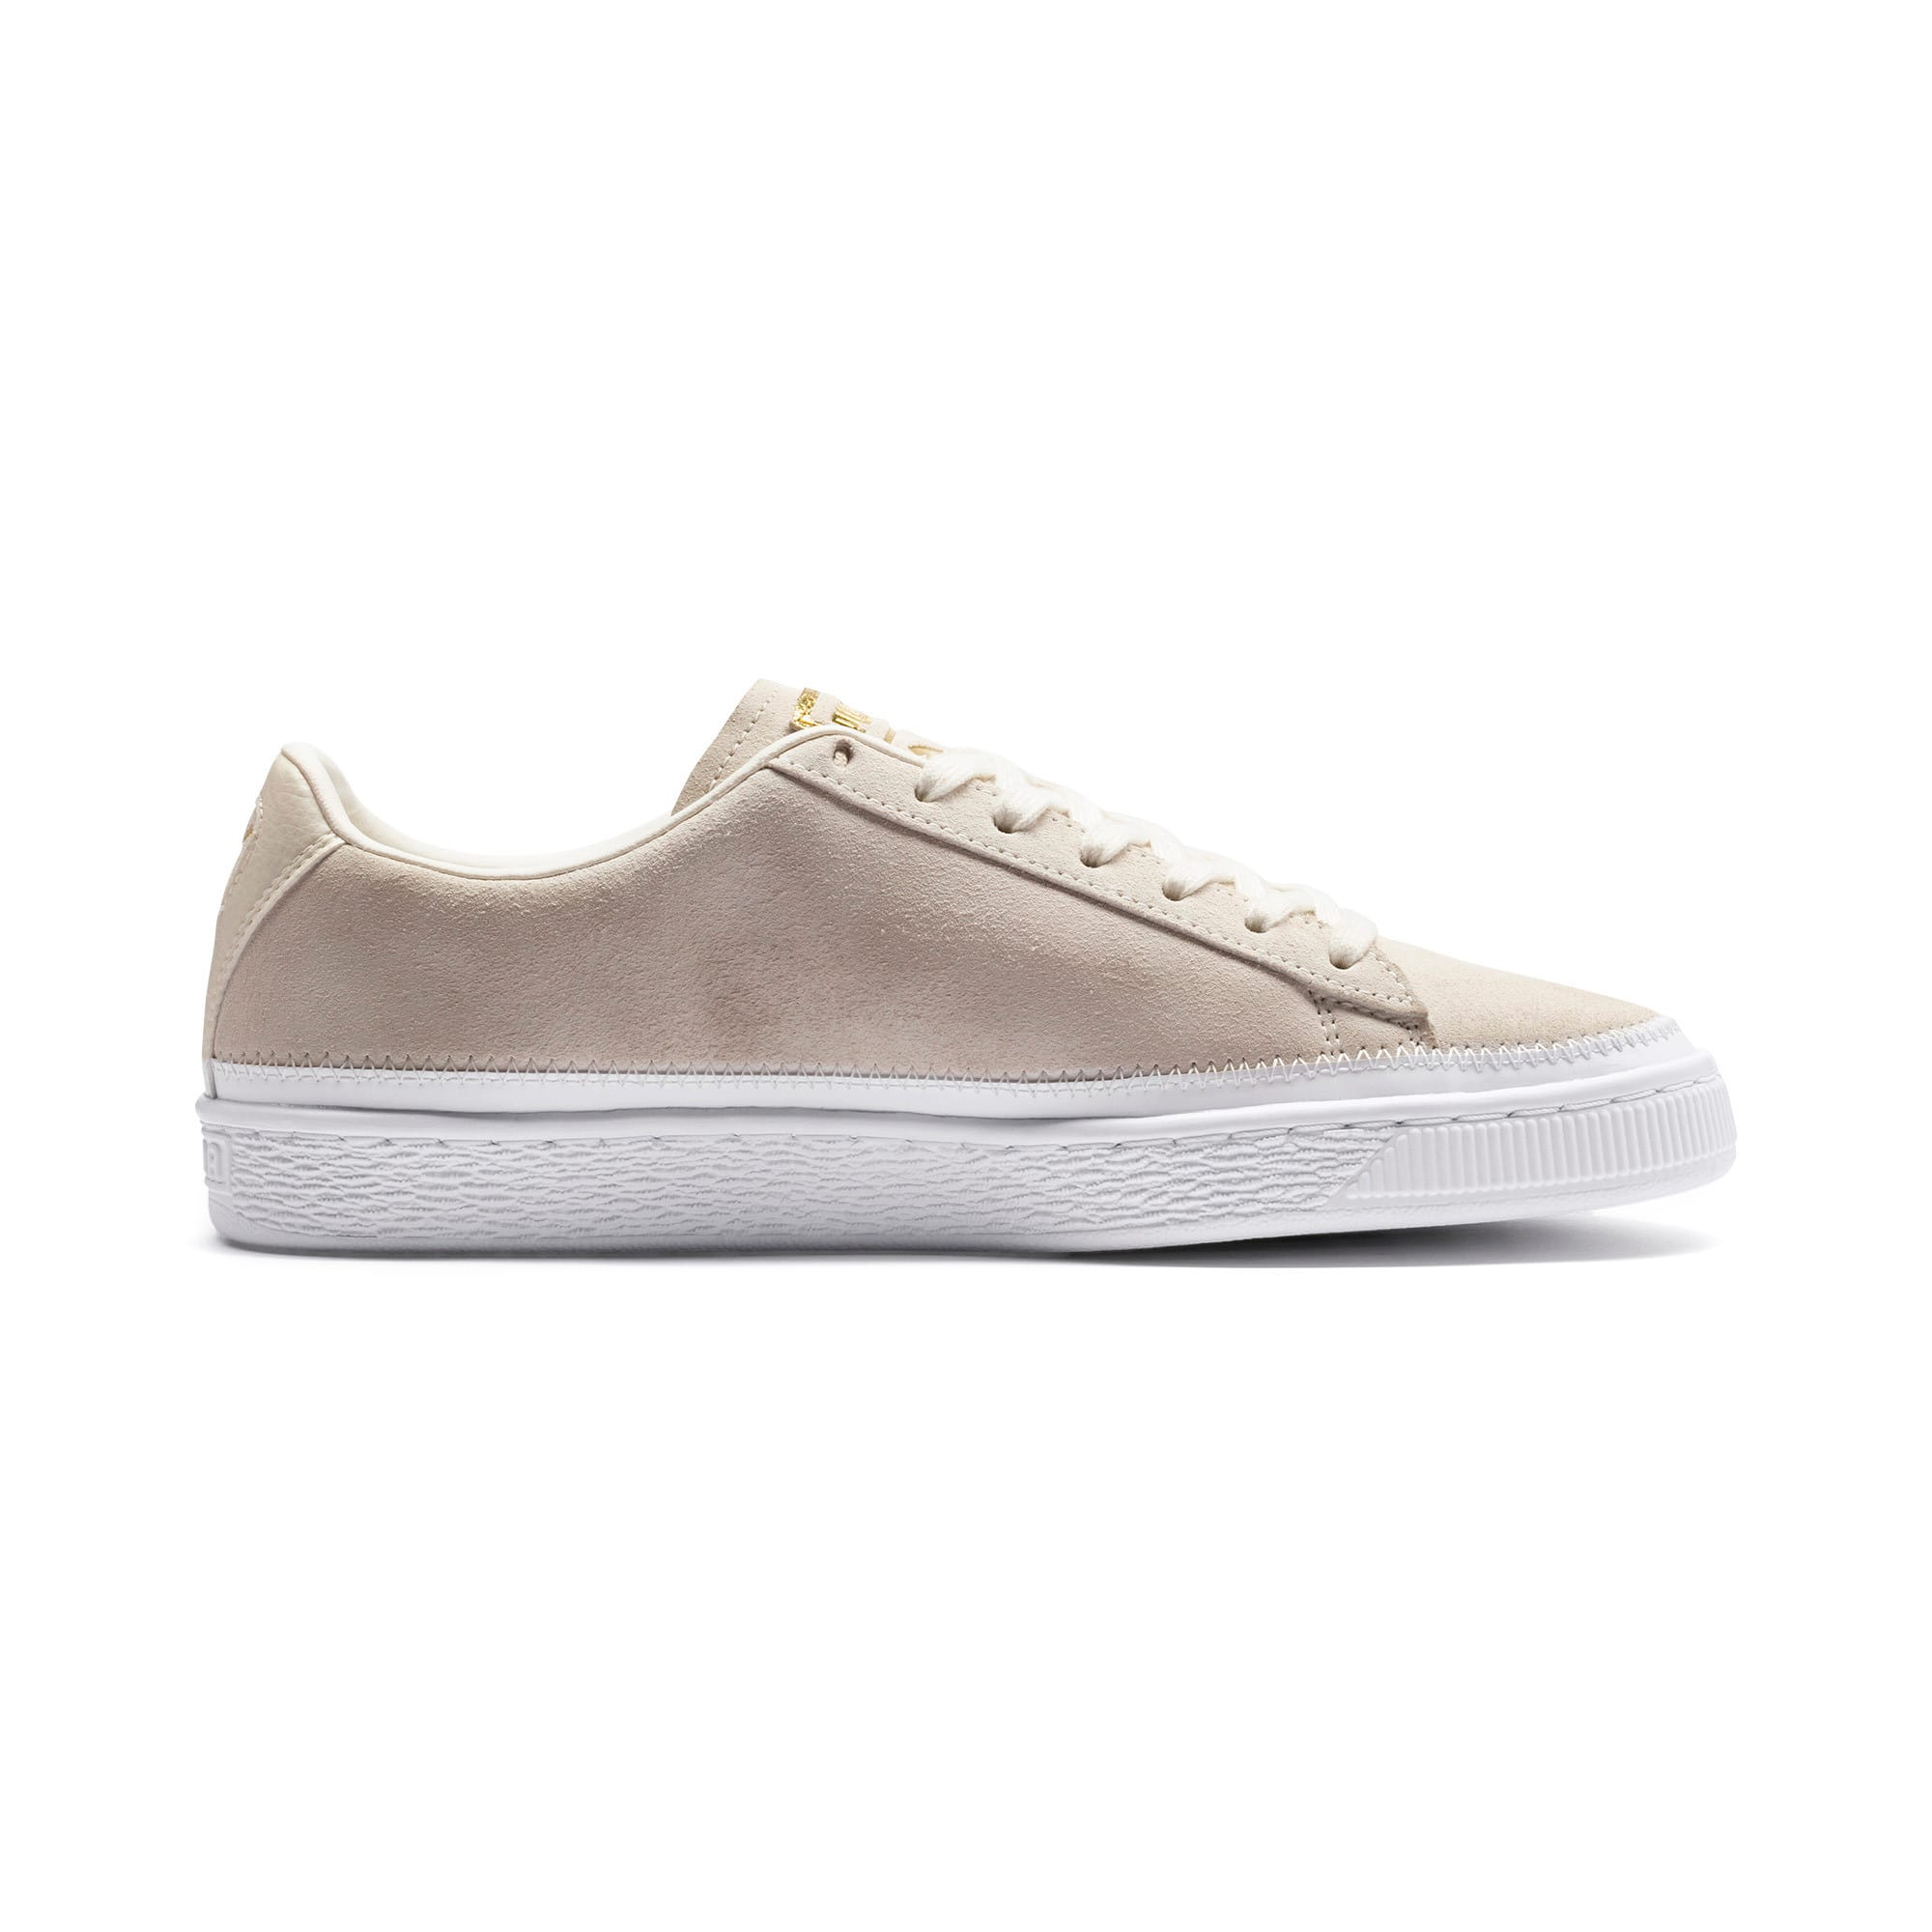 Thumbnail 6 of Suede Trim Sneaker, Whisper White-White- Gold, medium